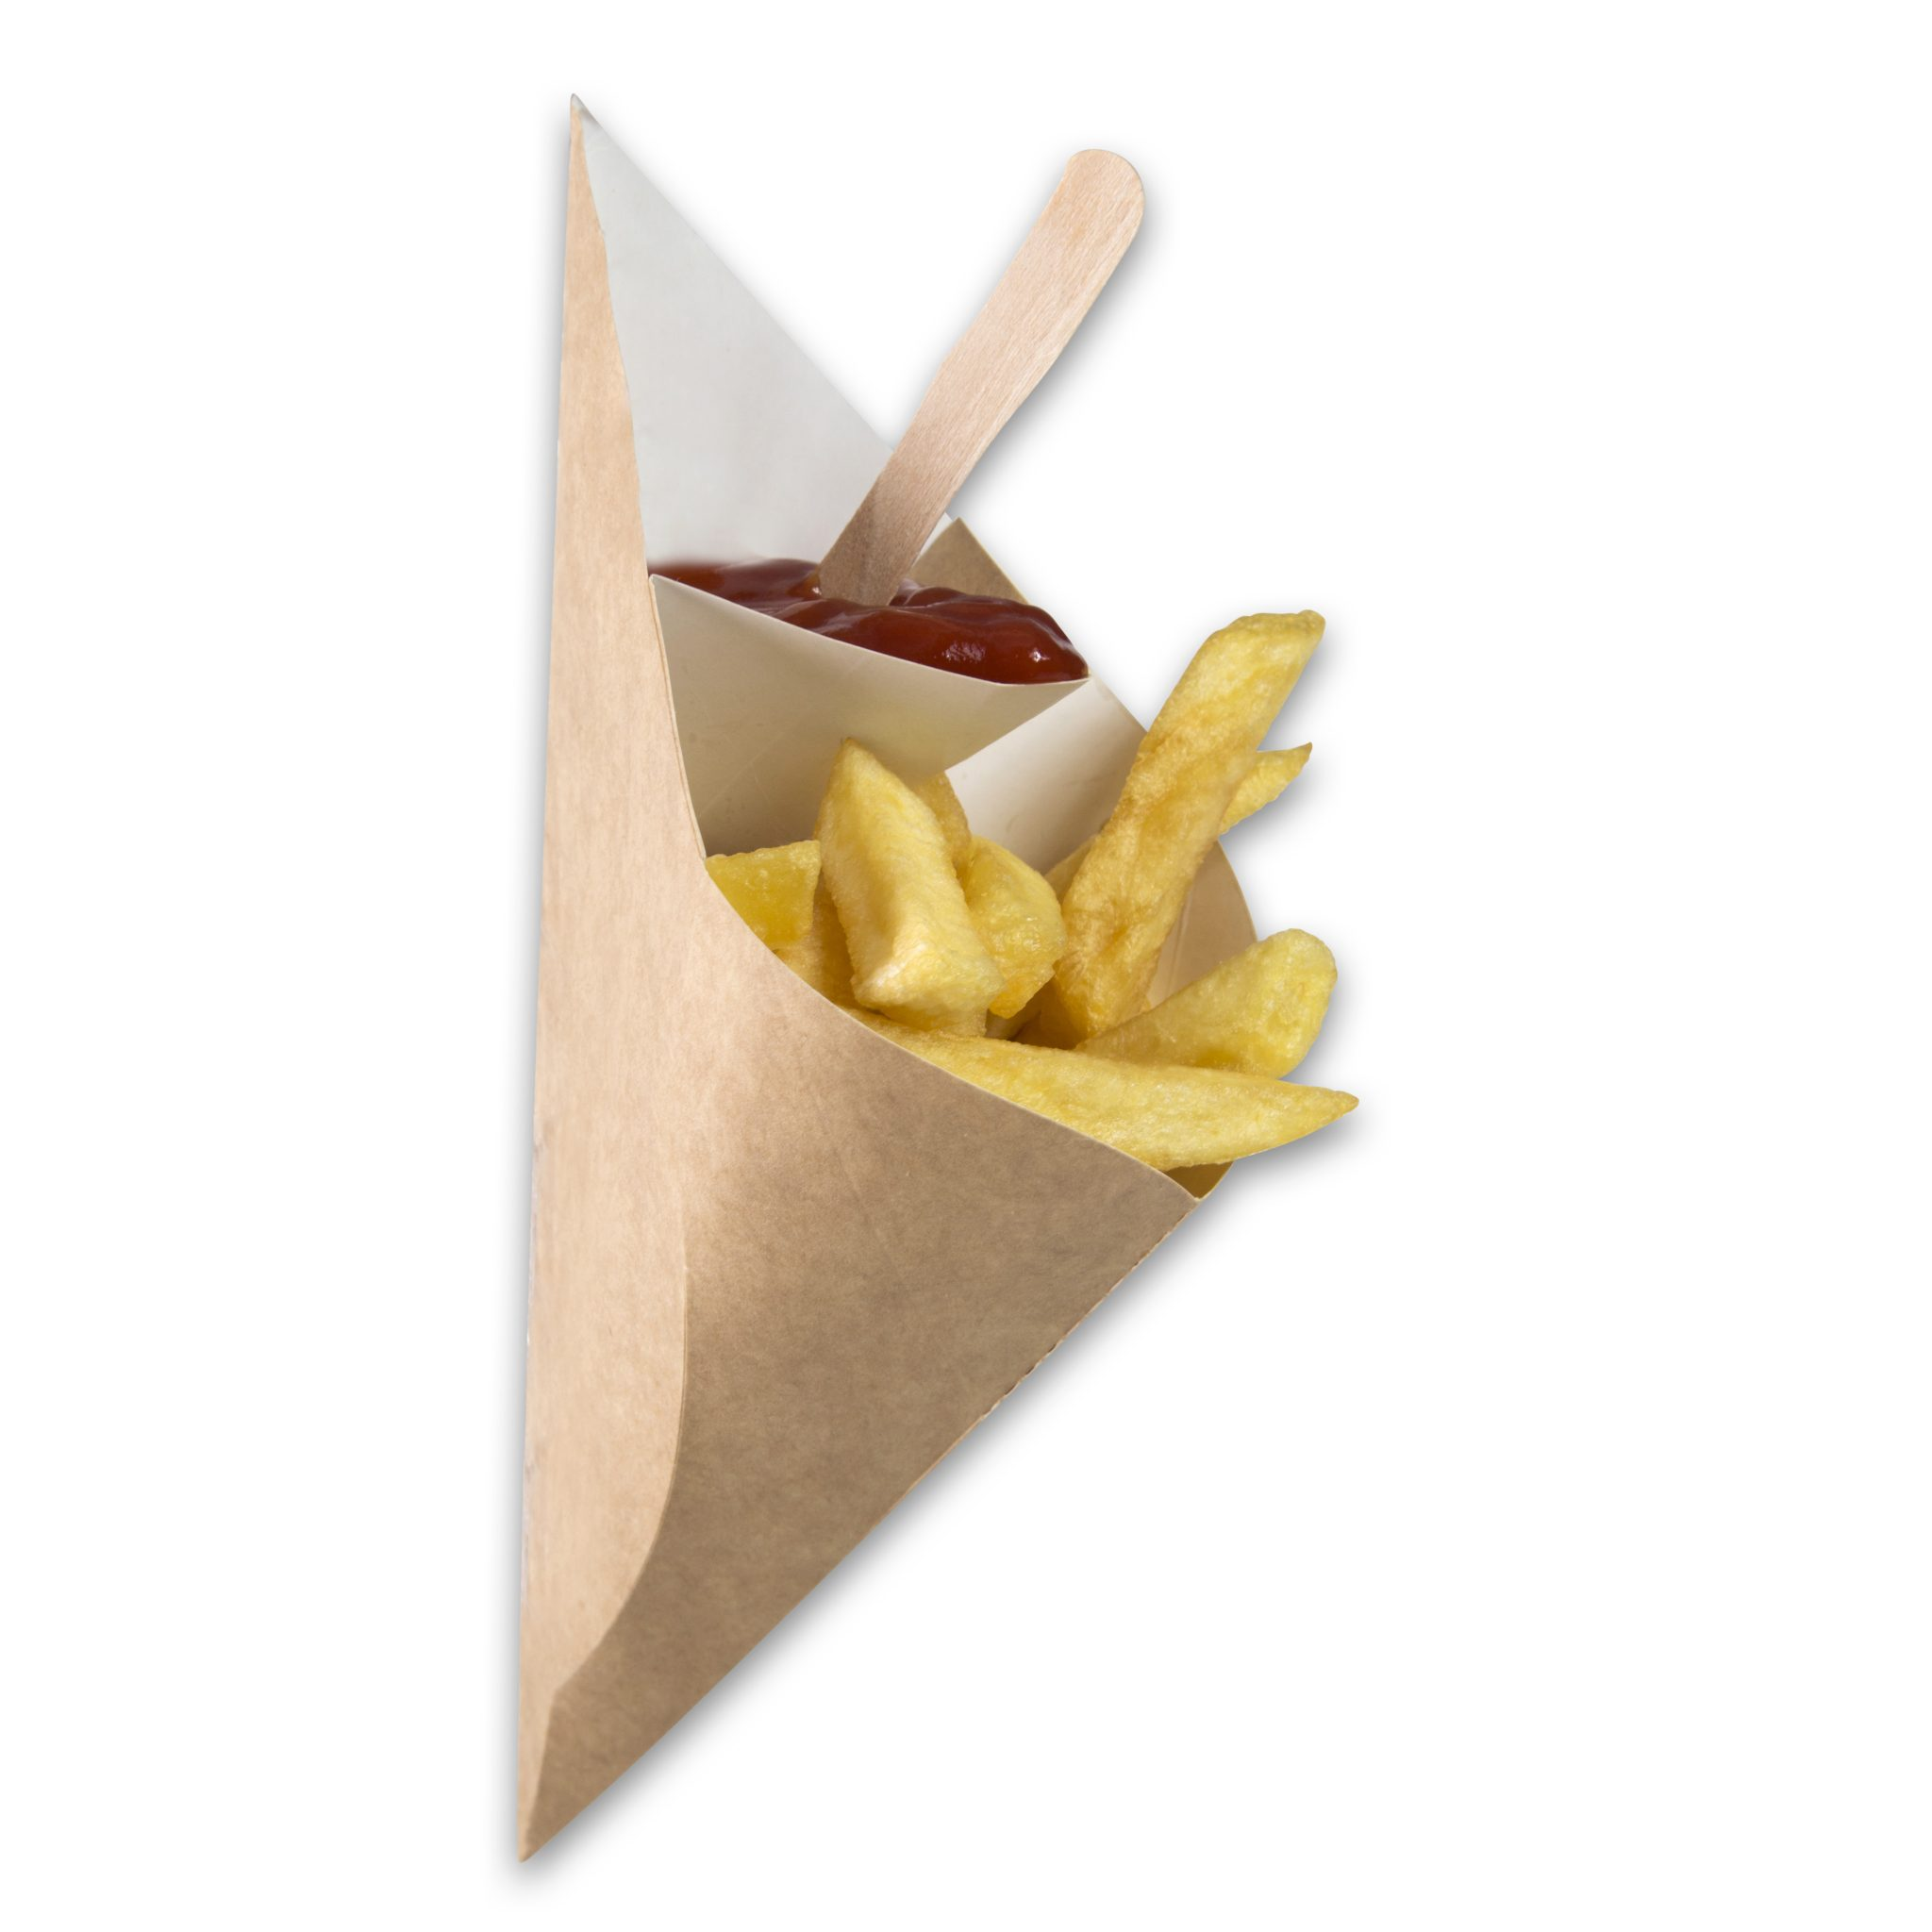 Kraft karton Frietzak met sausvak small 212x164x141 mm snackverpakking Chip 'n Dip klein (5)